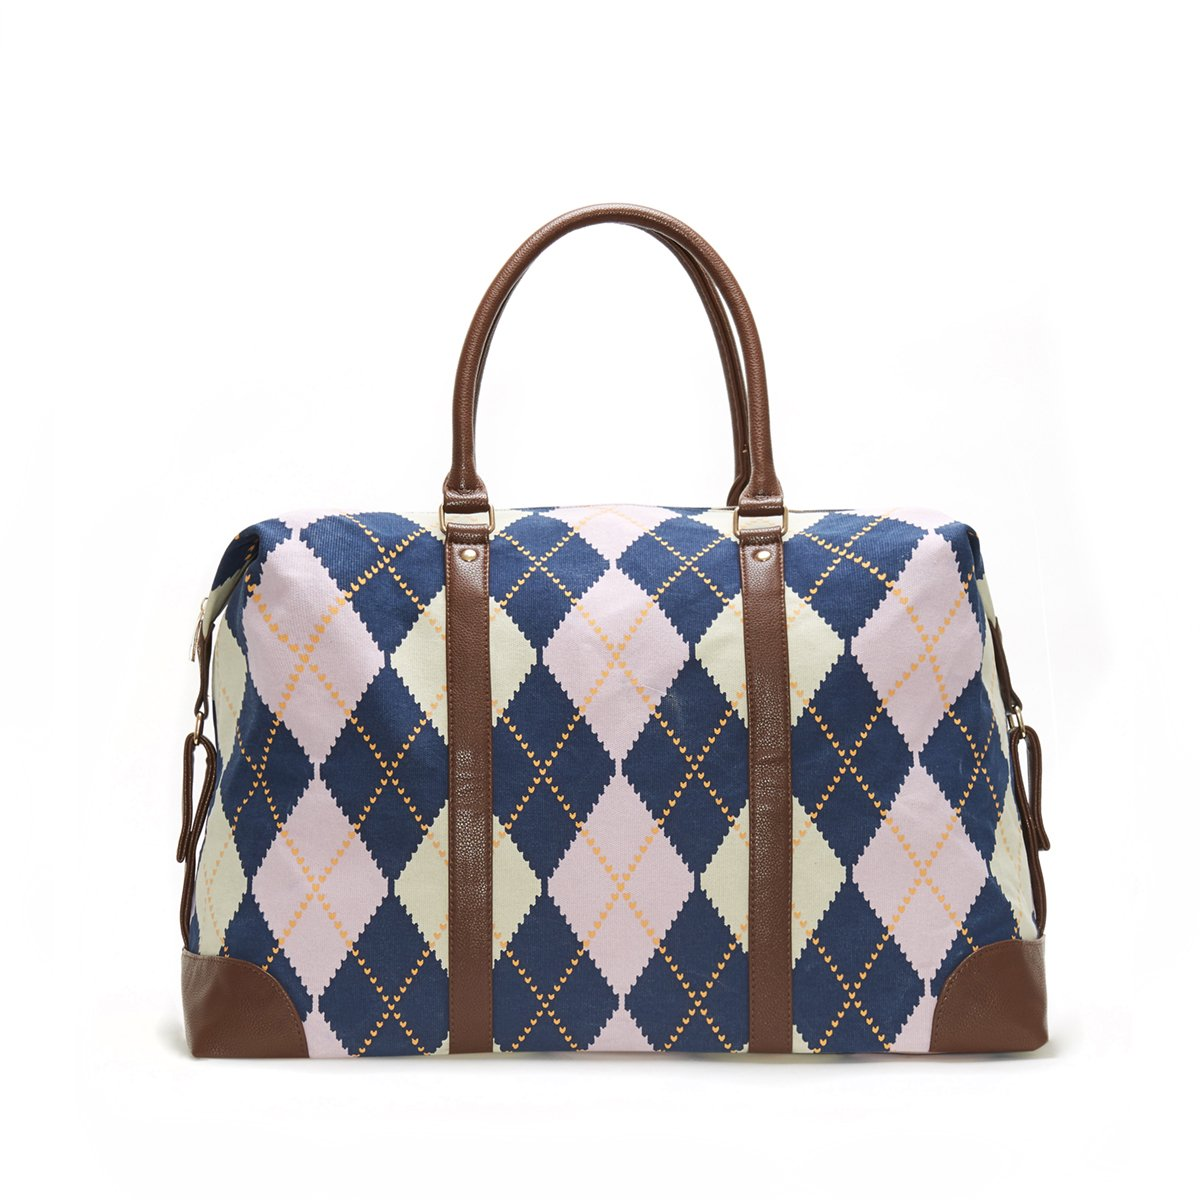 Limited Time Sale Royal Heritage Print Argyle Duffle Fashion Bag - MSRP $99